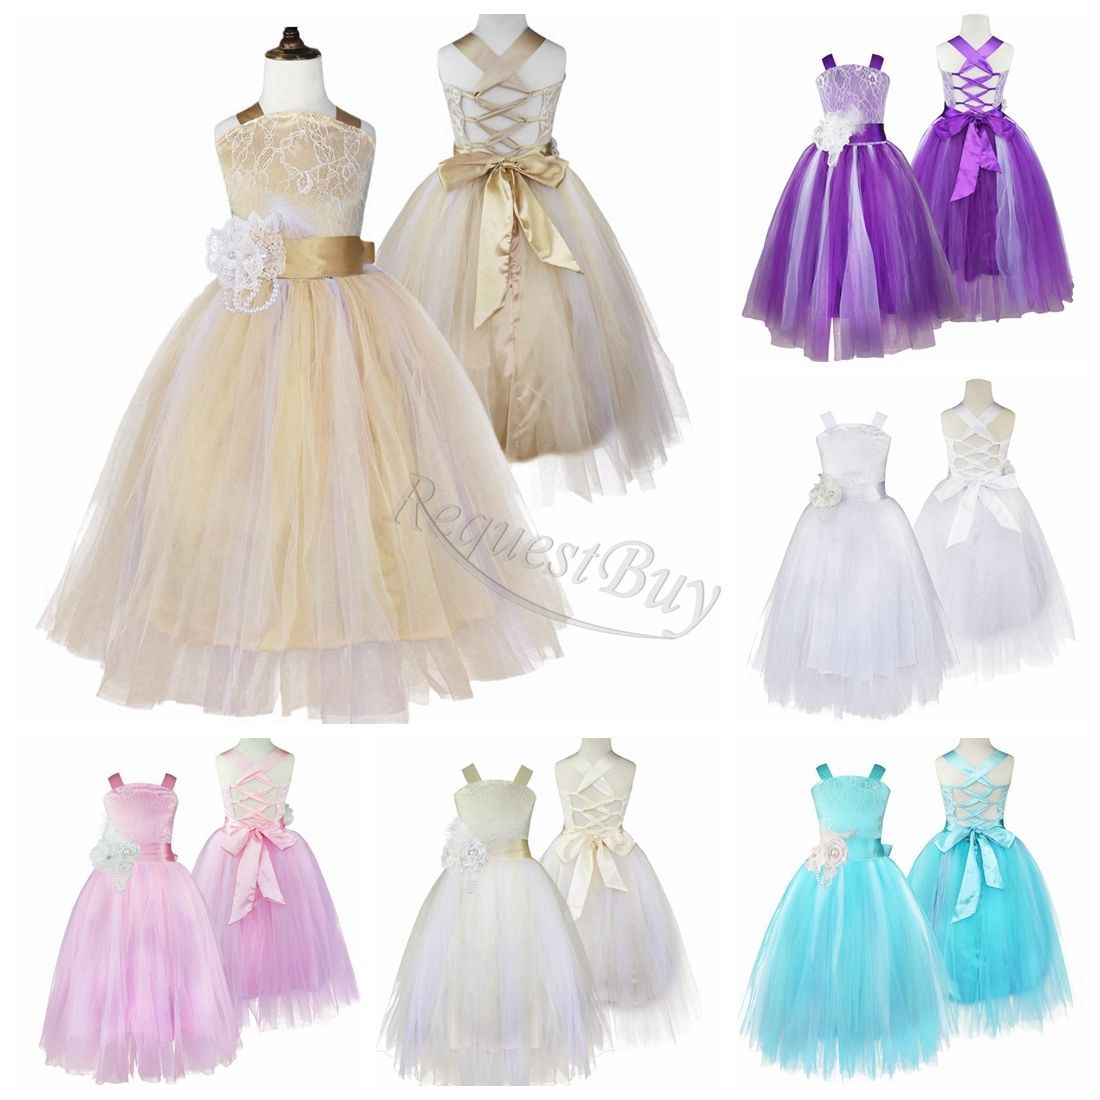 Baby Kid Girls V-back Satin Birthday Wedding Party Formal Flower Girl Dress Gown